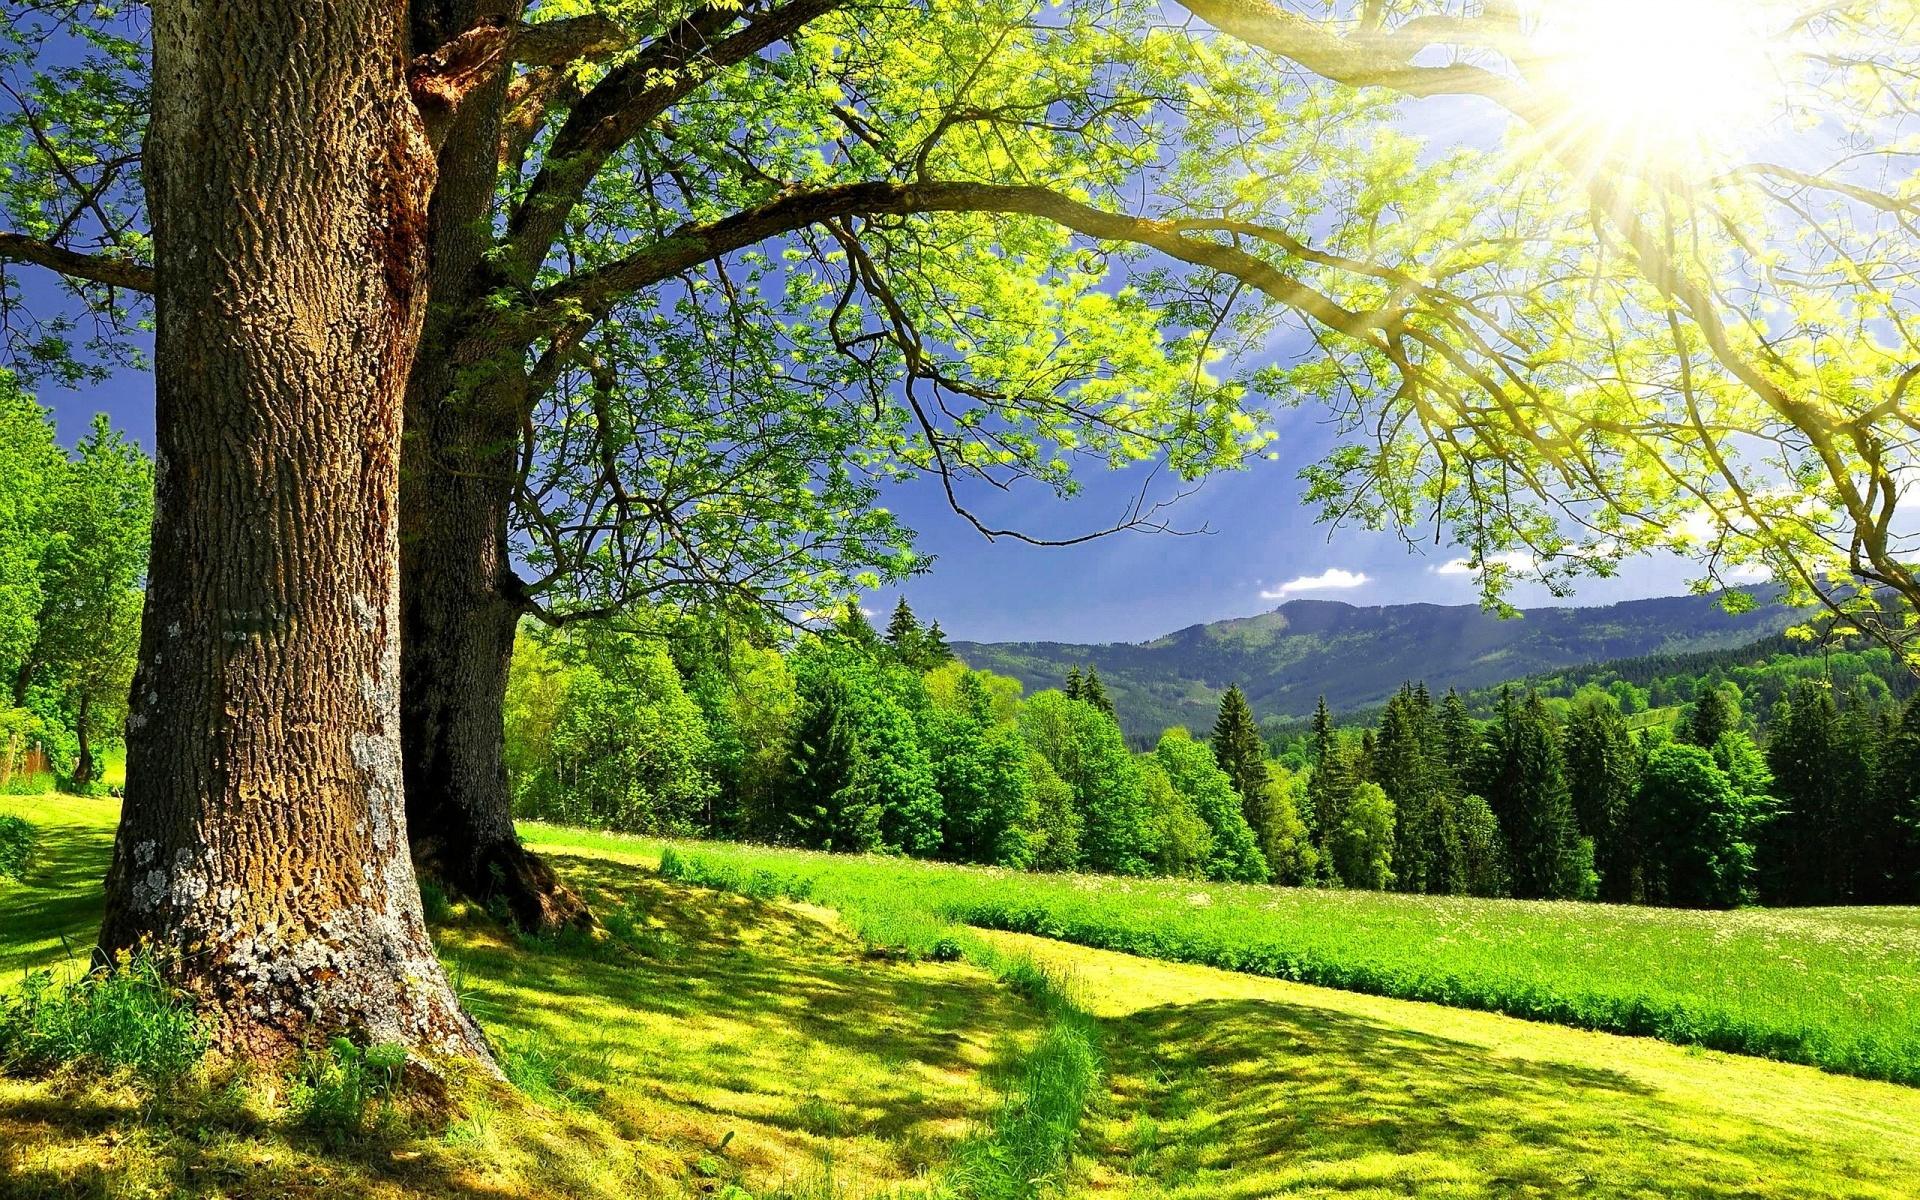 Sunny Day Wallpaper